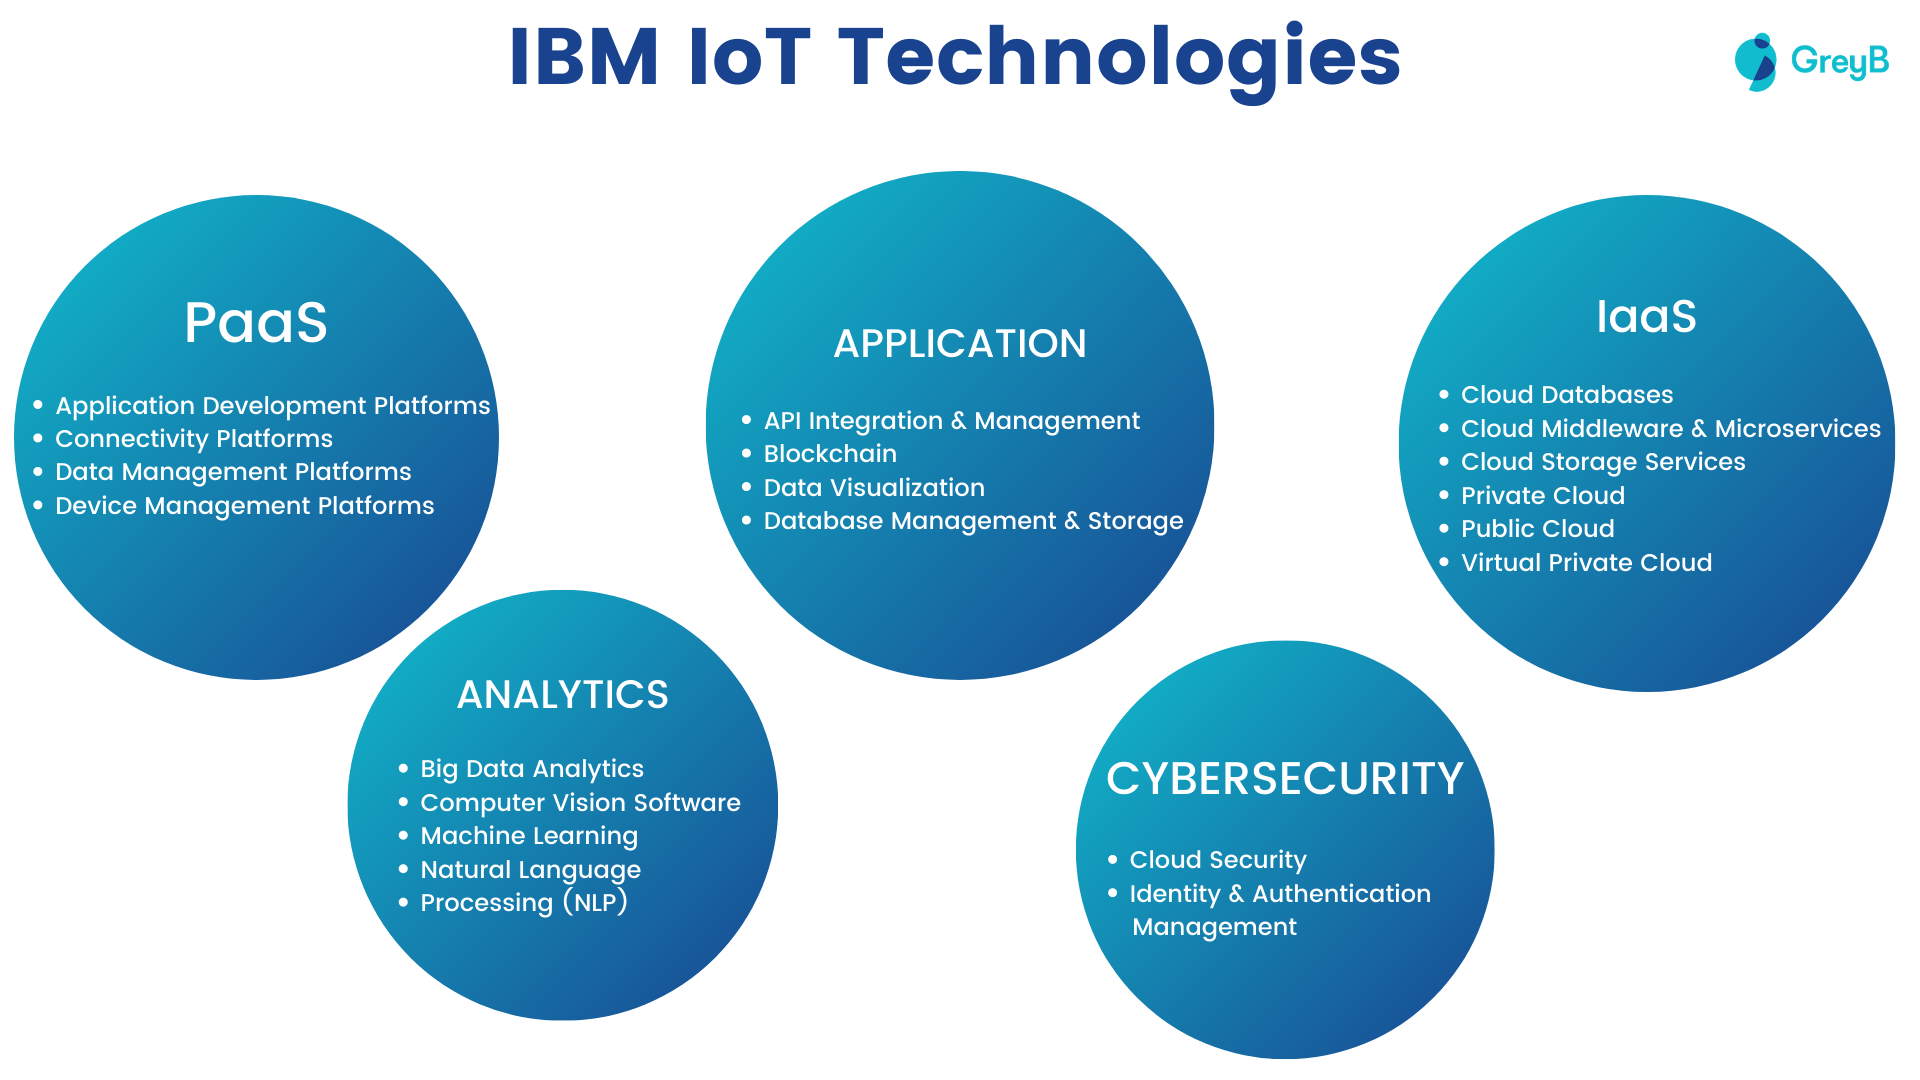 IBM IoT Technologies